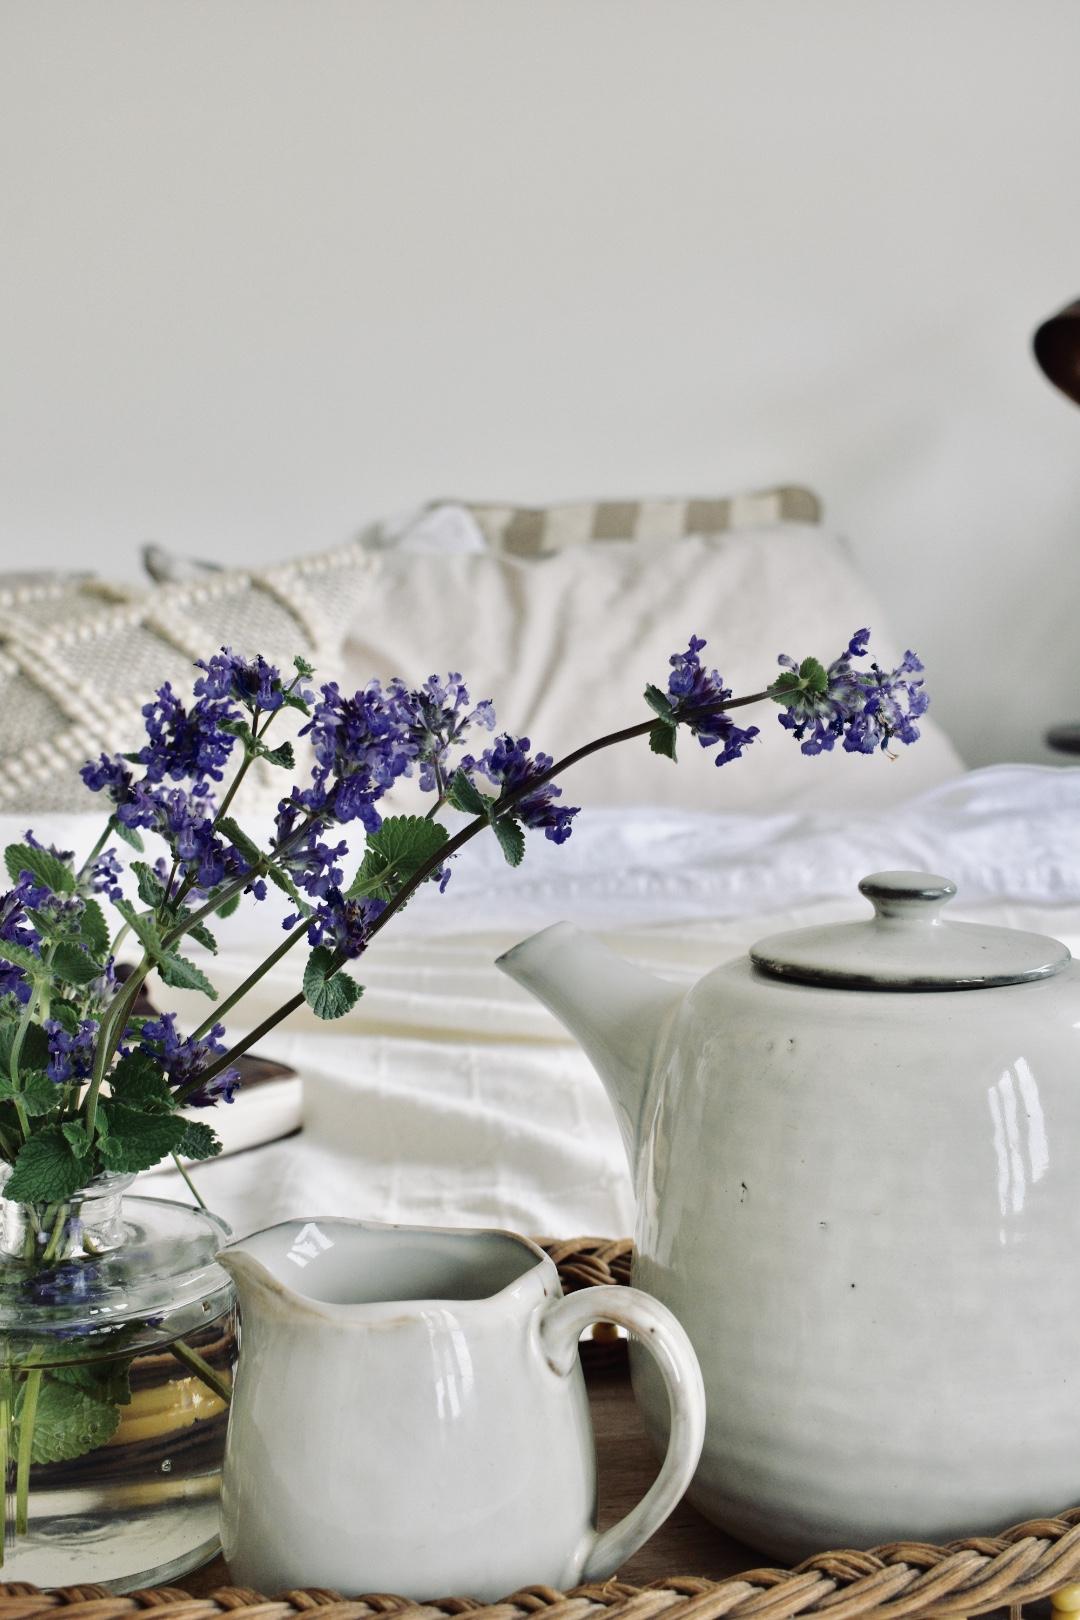 Old Mother Hubbard Tea Pot Bedroom